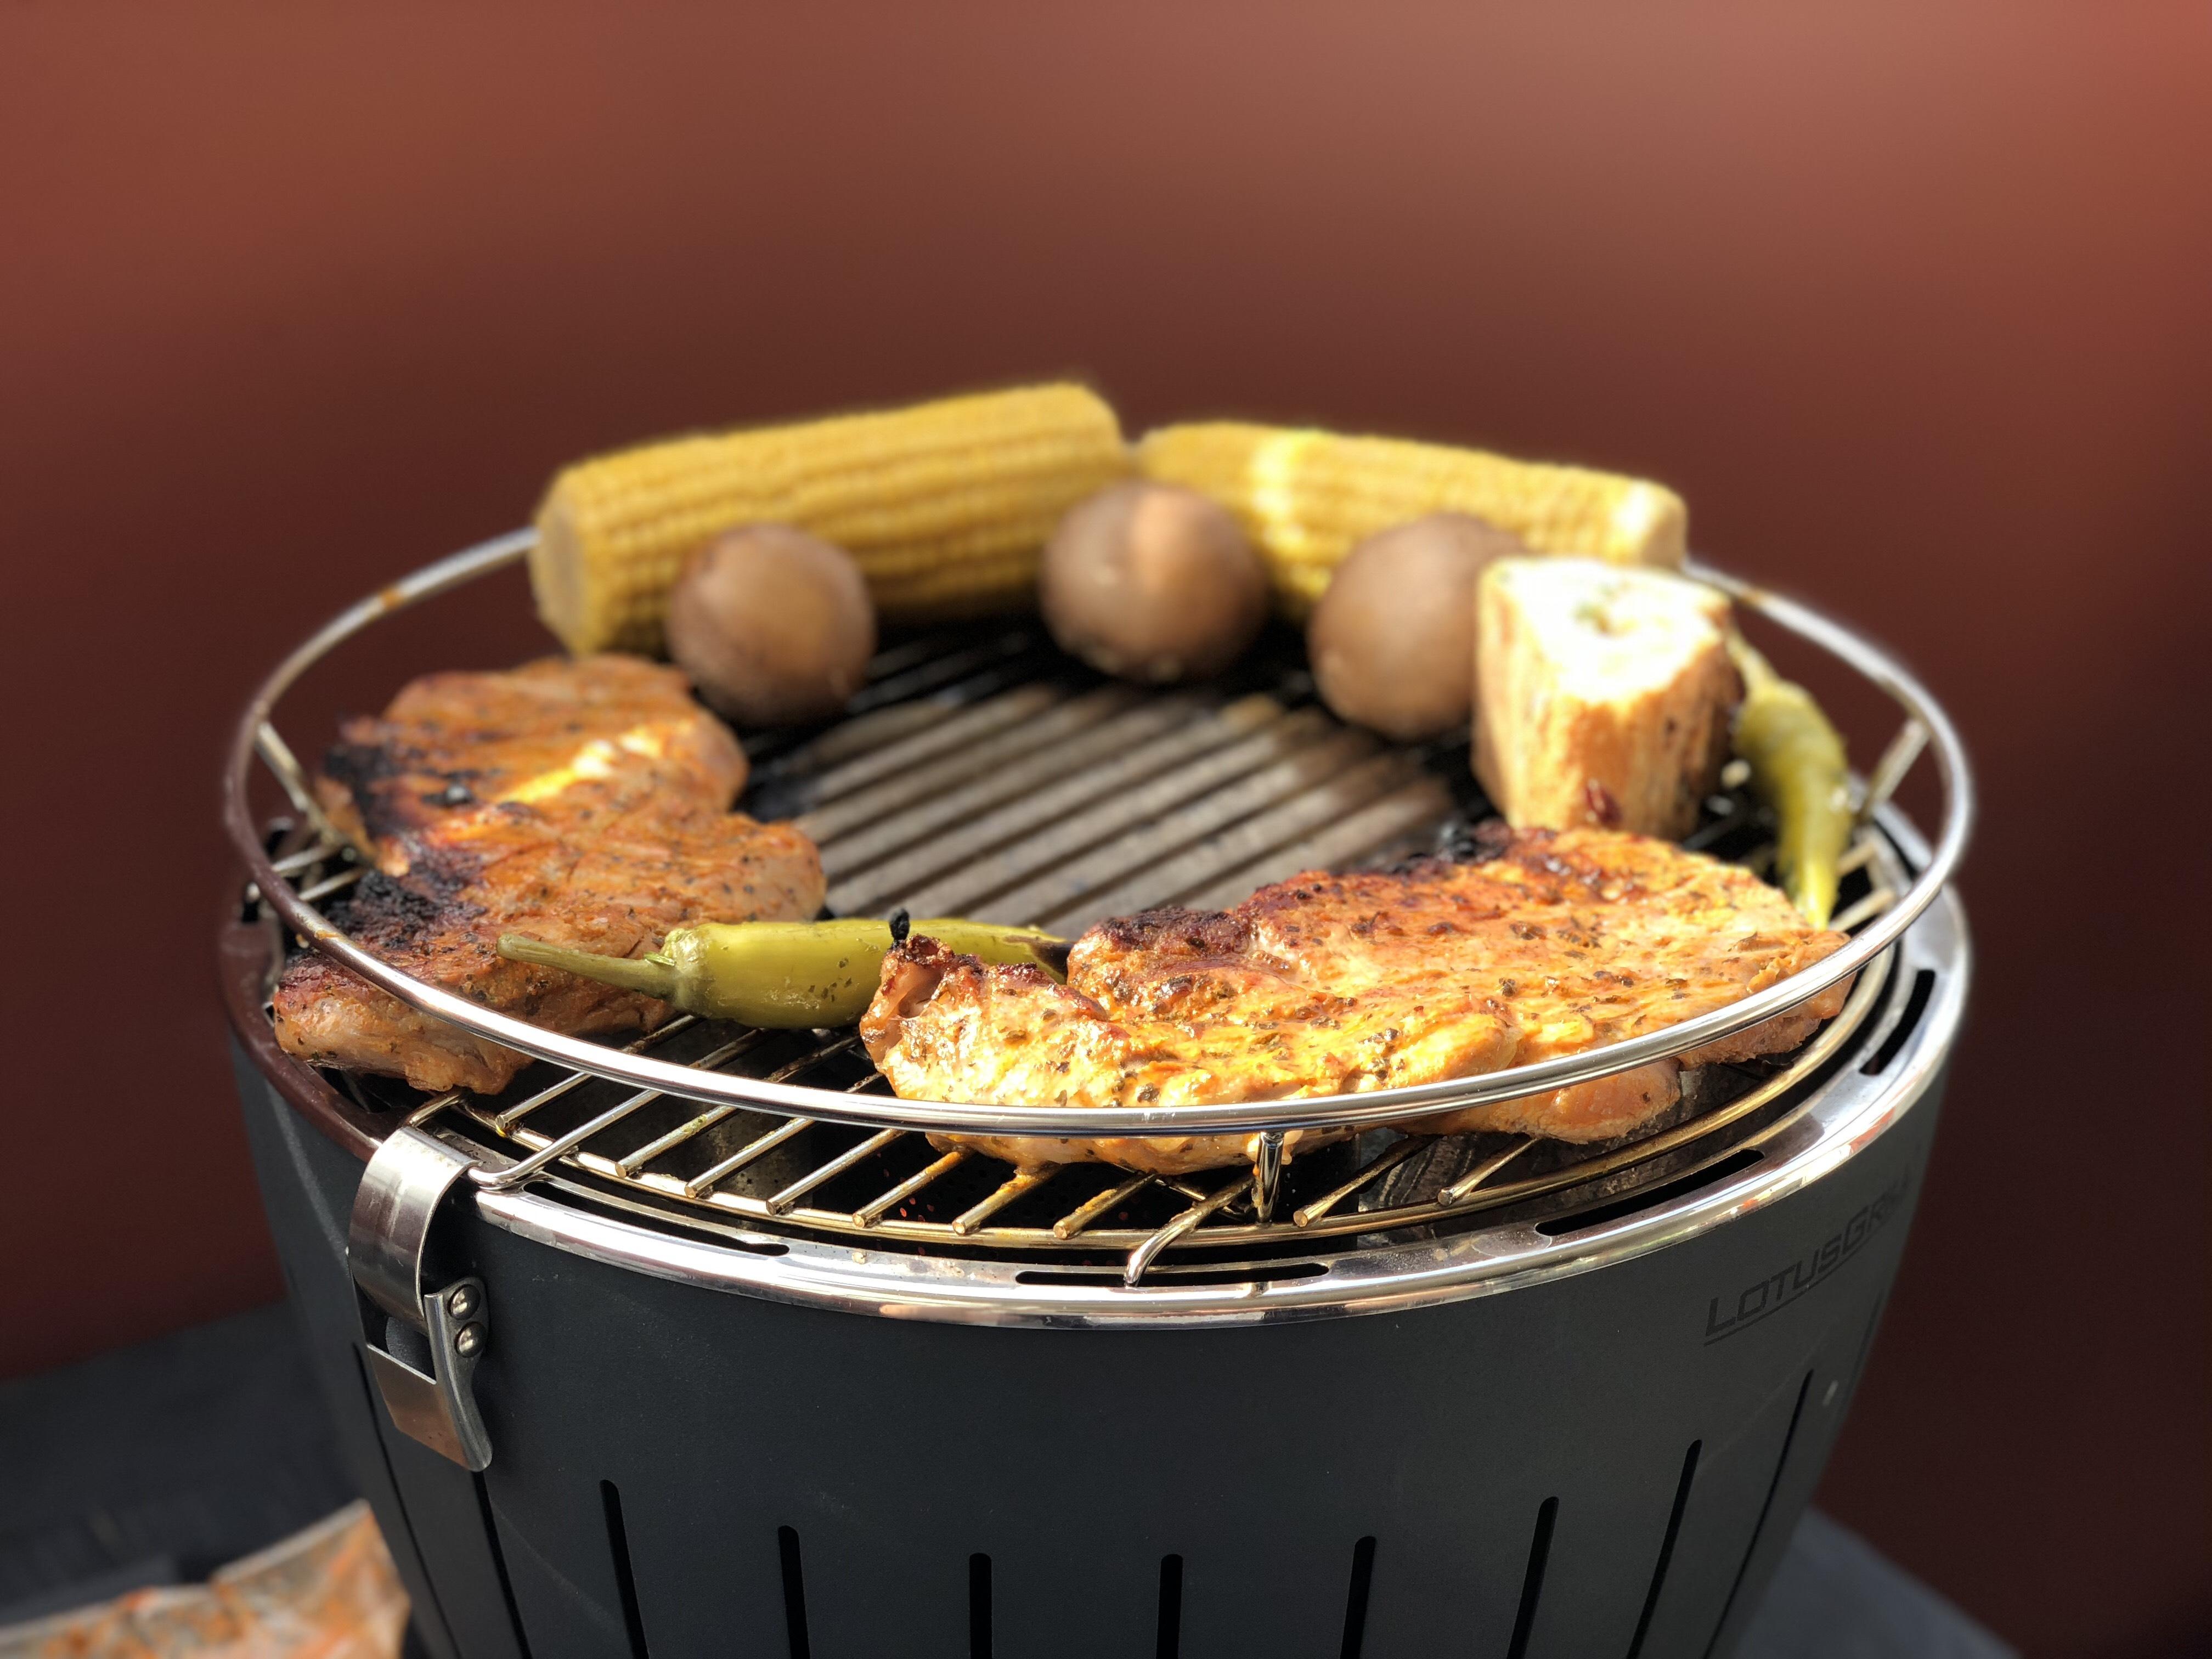 Rösle Gasgrill Steakzone : RÖsle bbq station videro g s gasgrill stahl schwarz grill